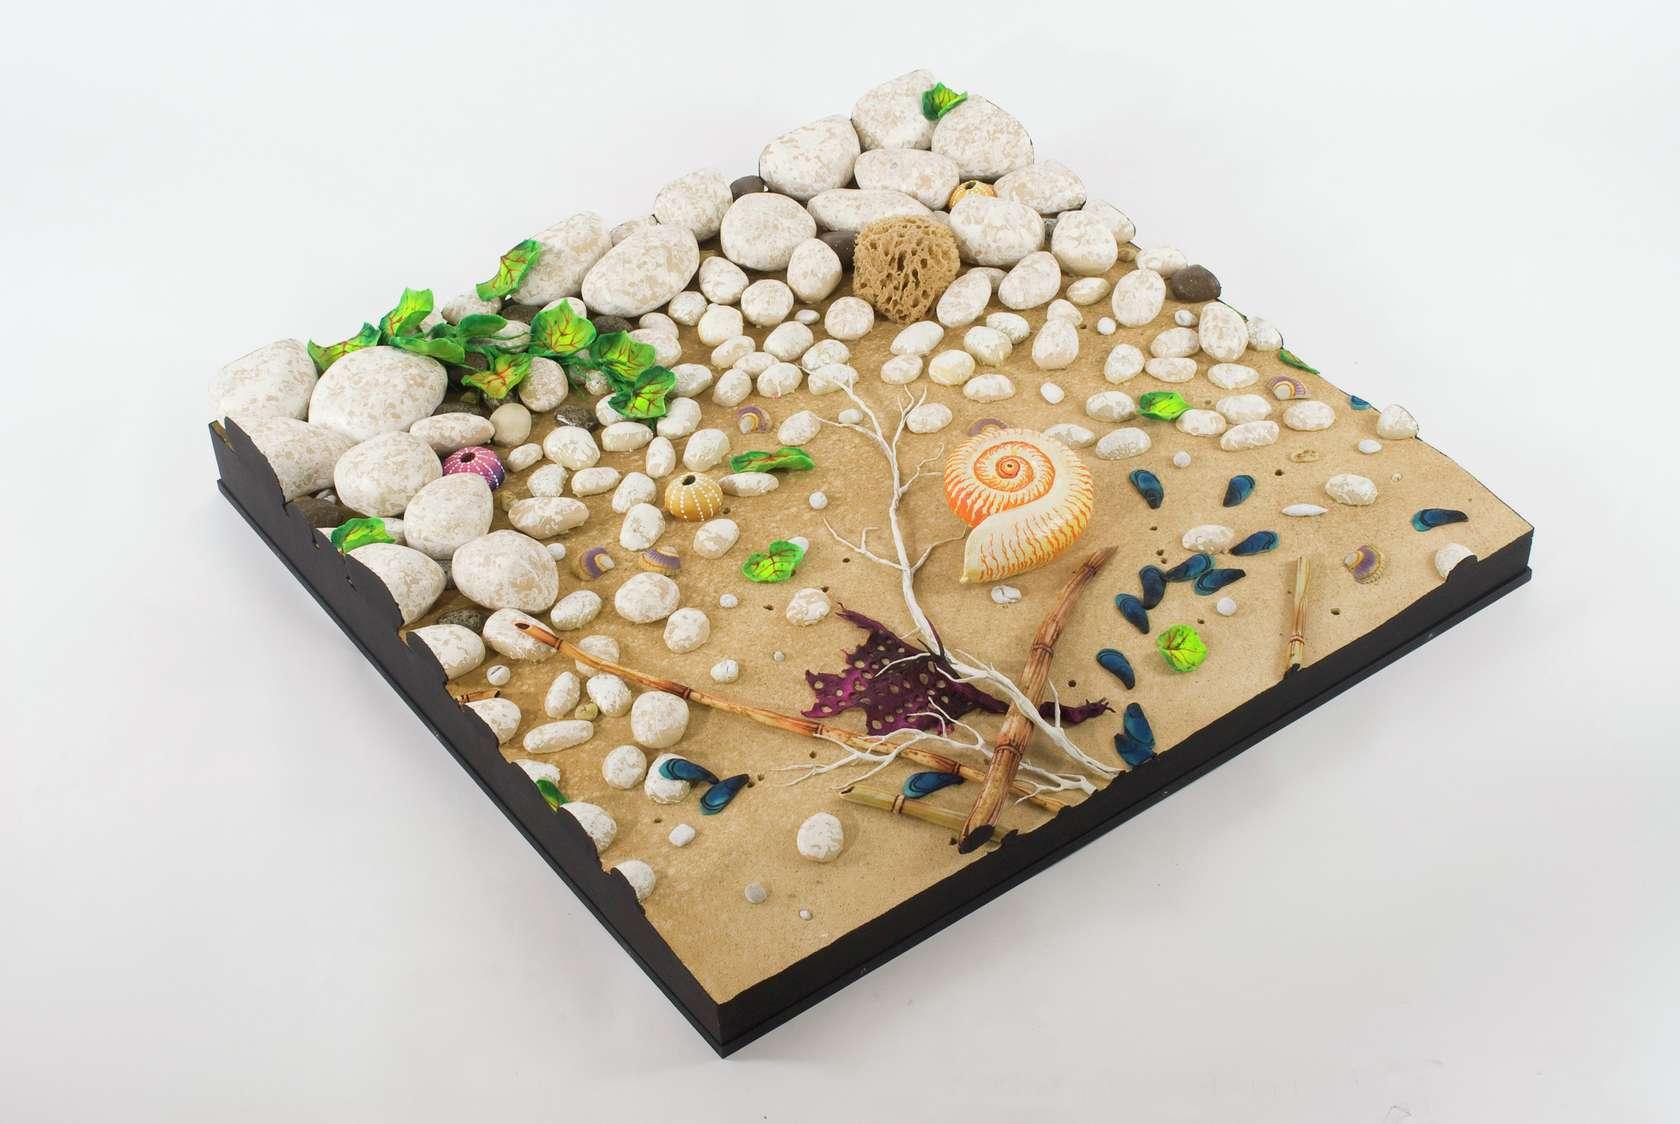 Piero Gilardi, Spiaggia con Nautilus, 2009 Mousse de polyuréthane100 × 100 × 20 cm / 39 3/8 × 39 3/8 × 7 7/8 in.